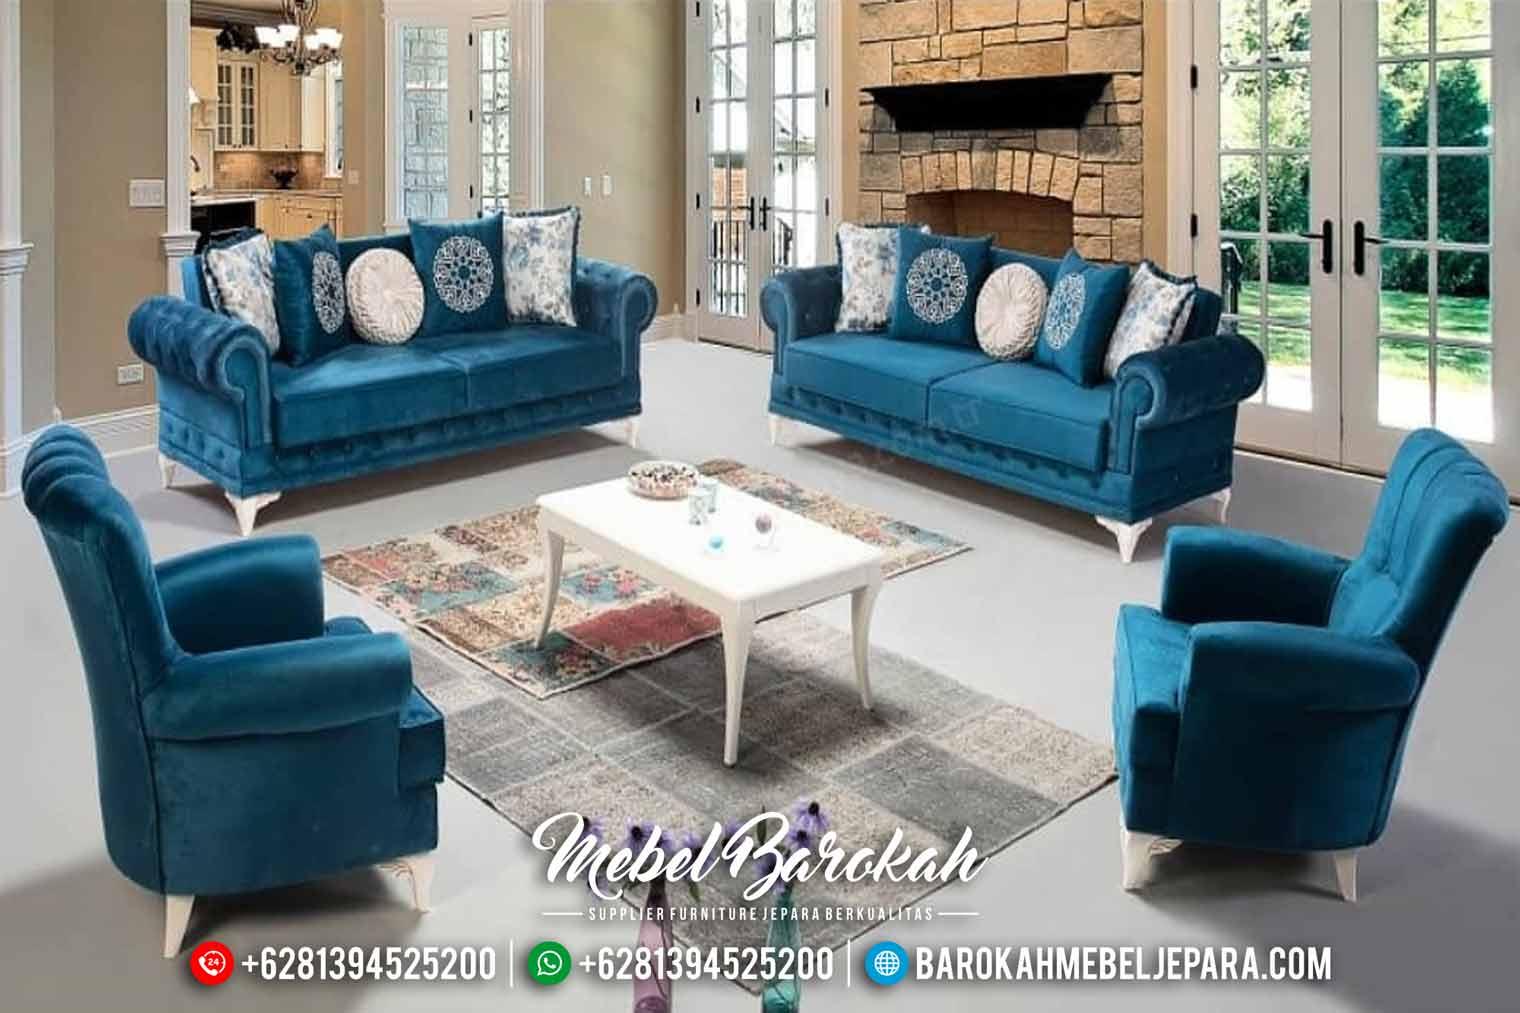 Sofa Tamu Chesterfield New Design Natural MB-0454